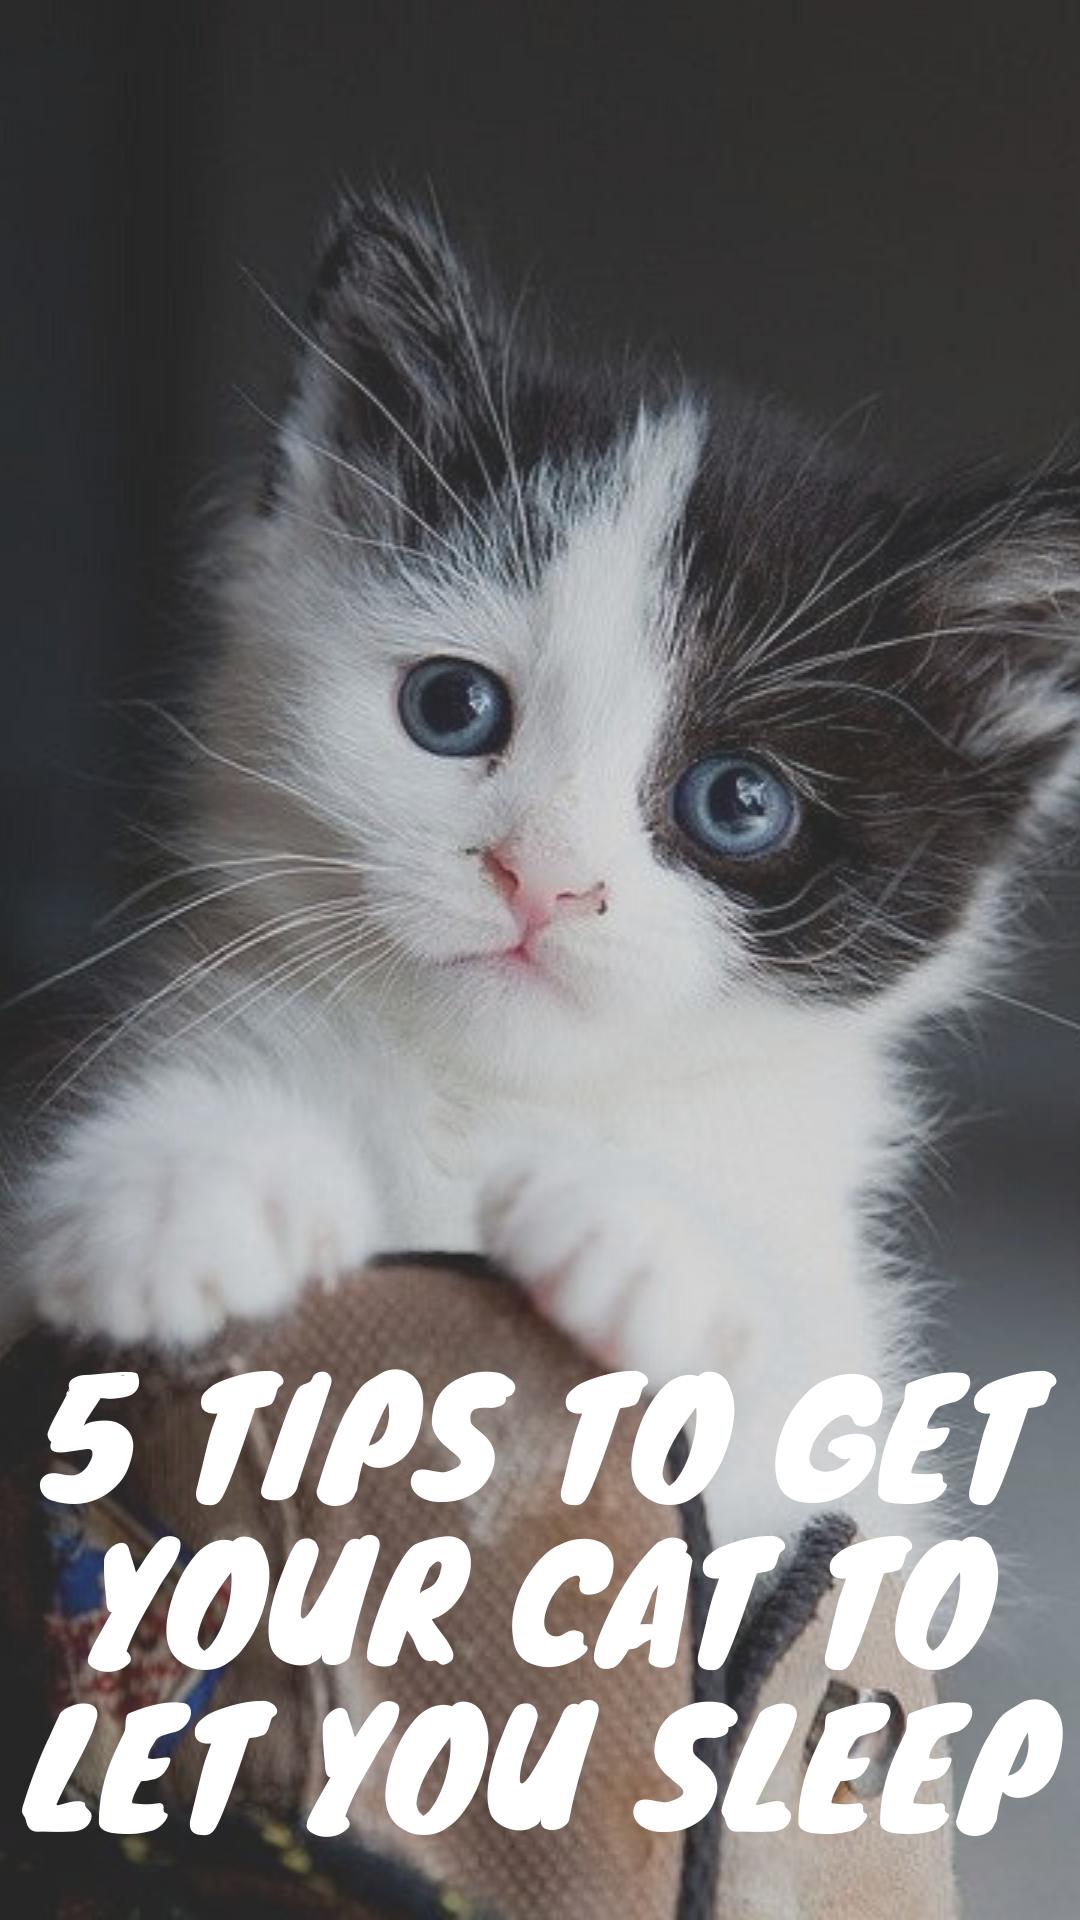 5 Tips To Get Your Cat To Let You Sleep In 2020 Cats Sleeping Kitten Kitten Health